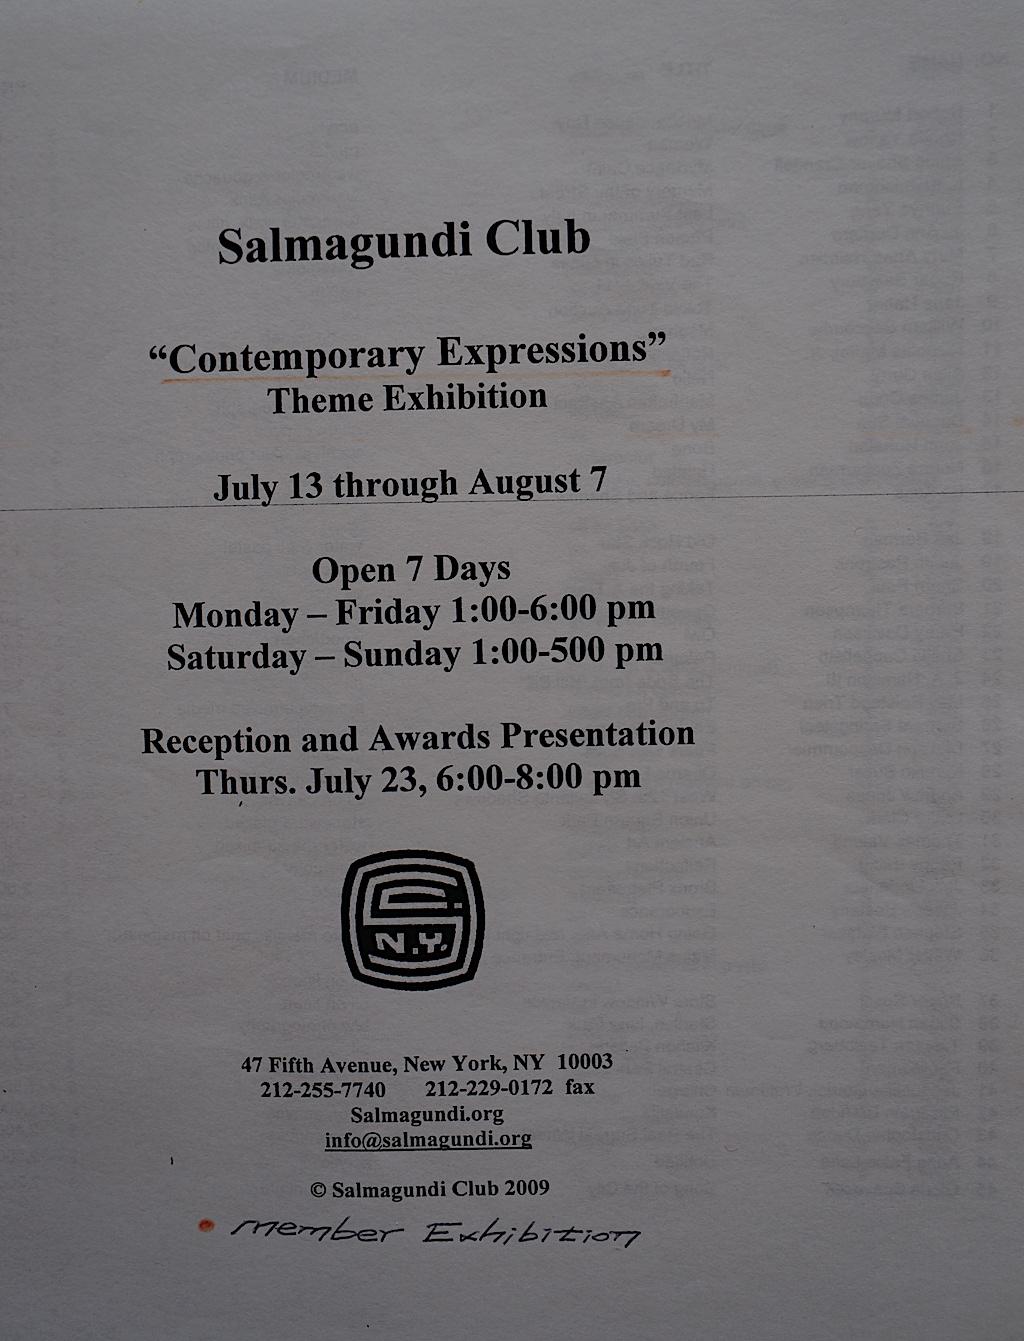 Salmagundi Club Member E-01